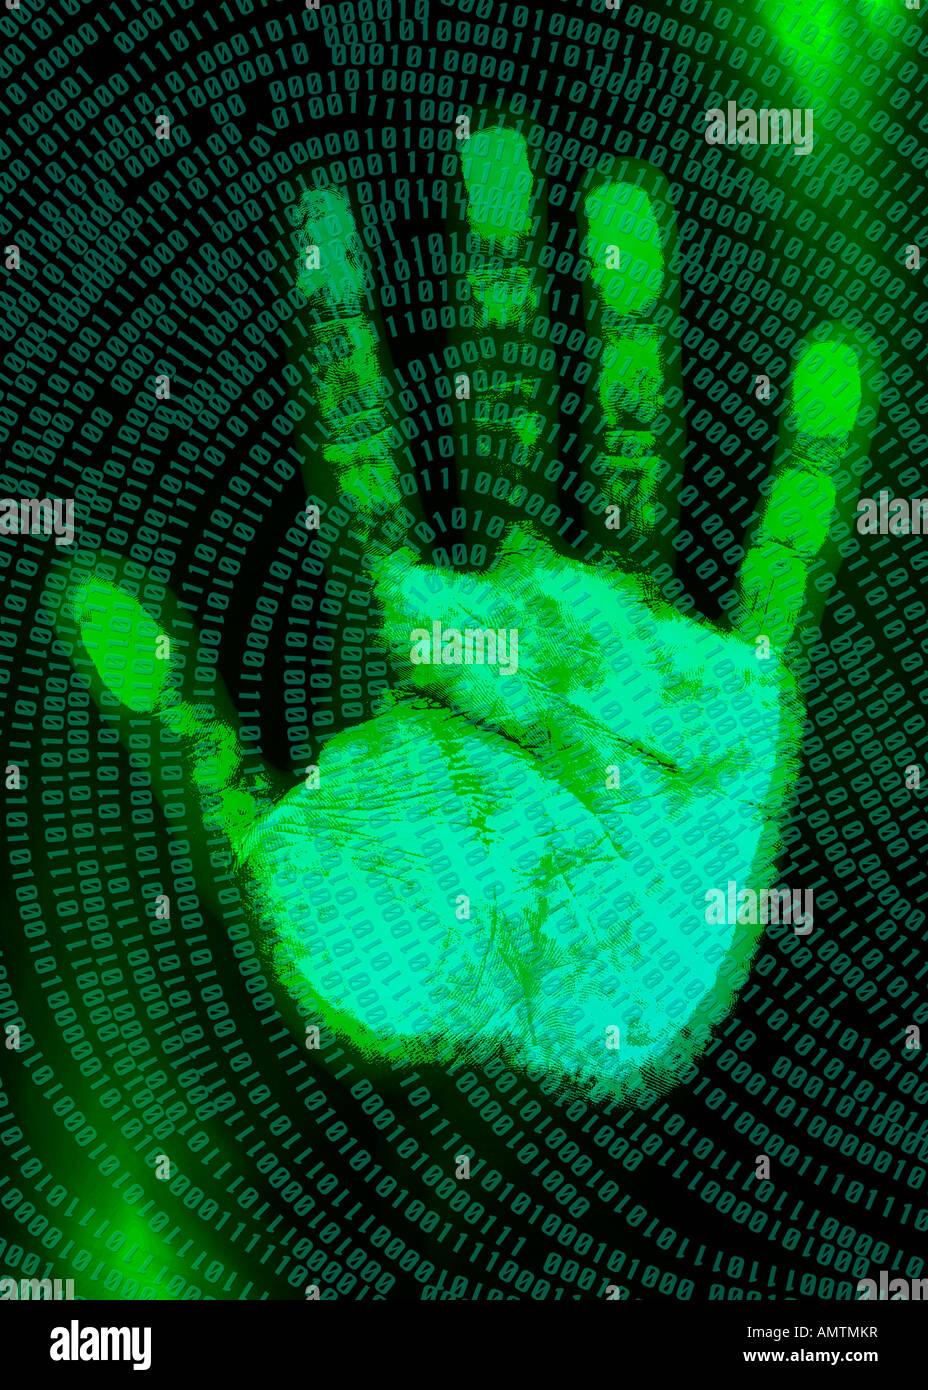 Digital Handprint Stock Photo 15335722 Alamy